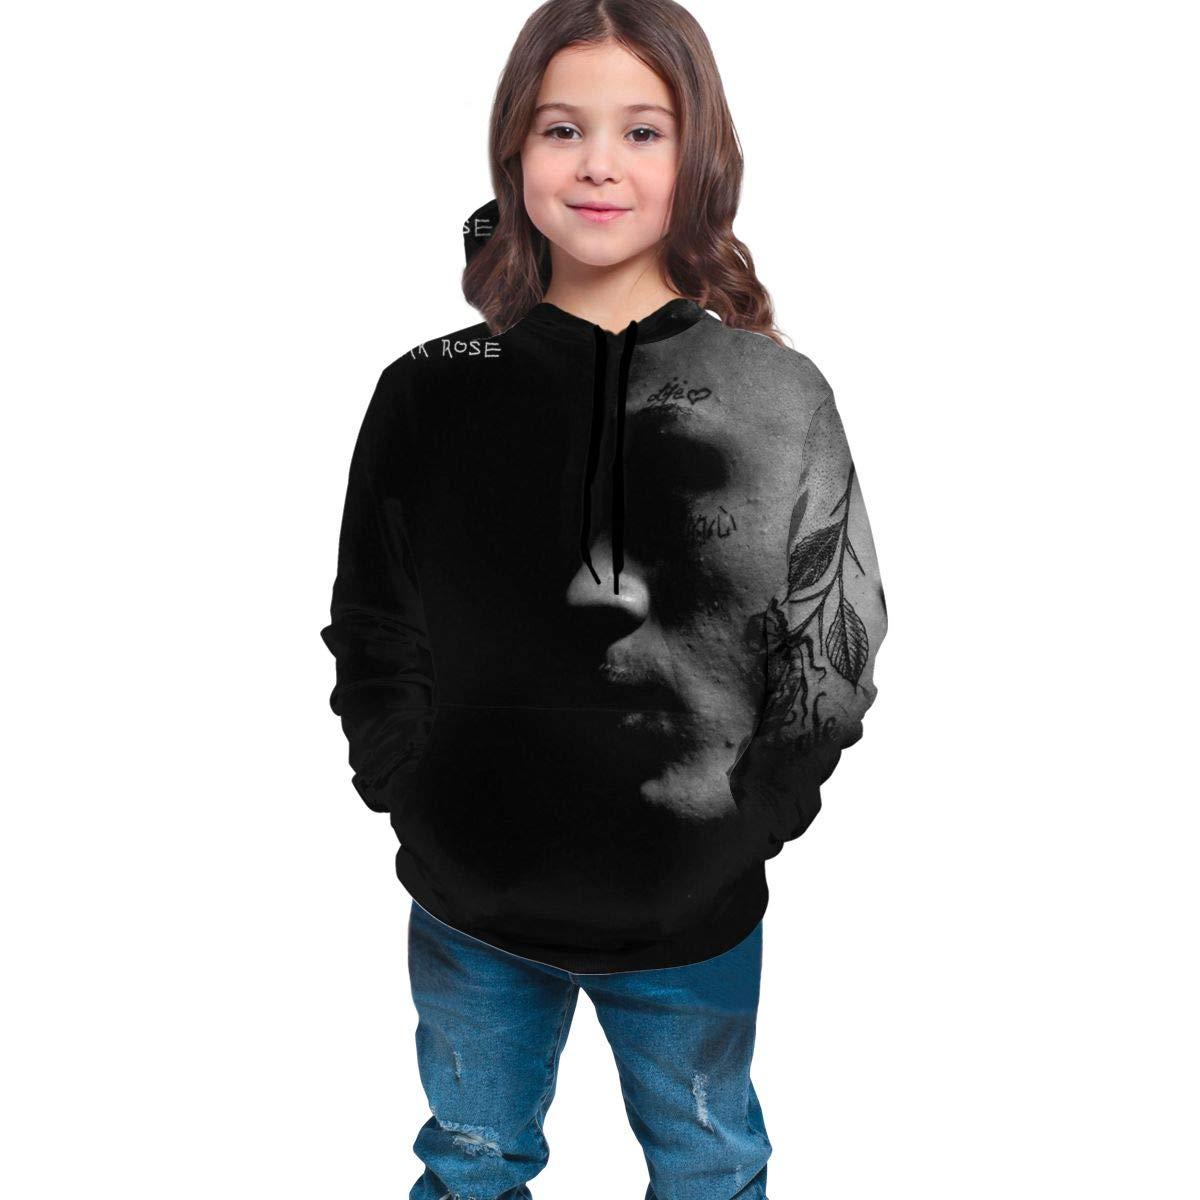 DenverHurst Lil Skies 7-20 Years Teen Pullover Sweatshirts for Boys Girls